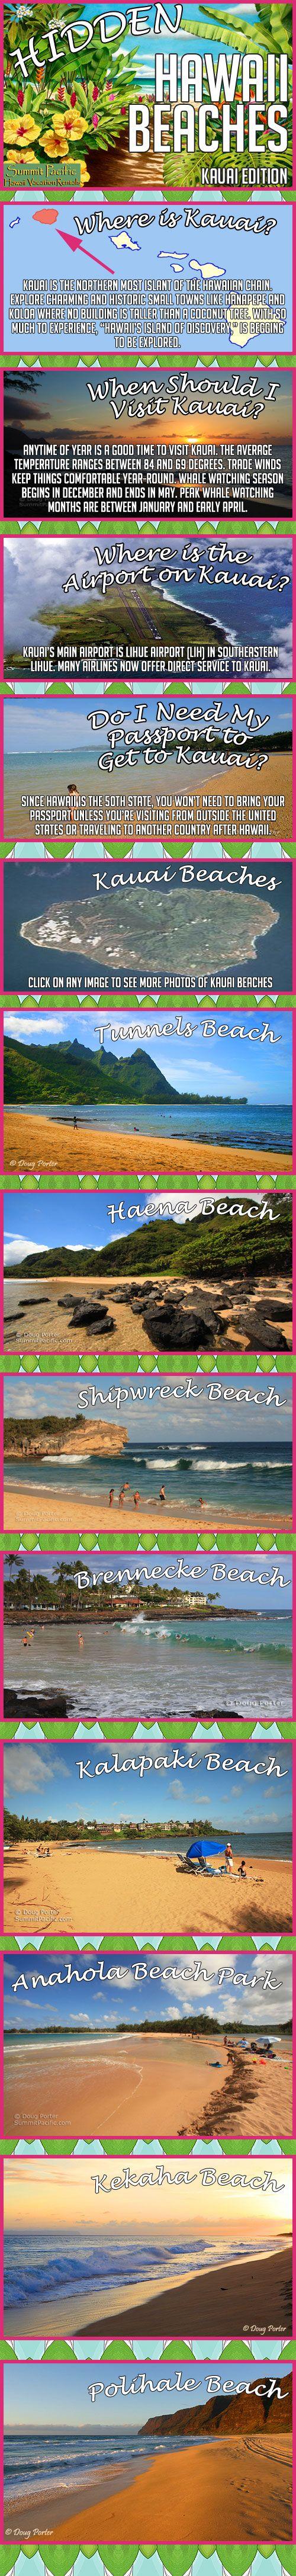 Find some of Hawaii's best hidden beaches!